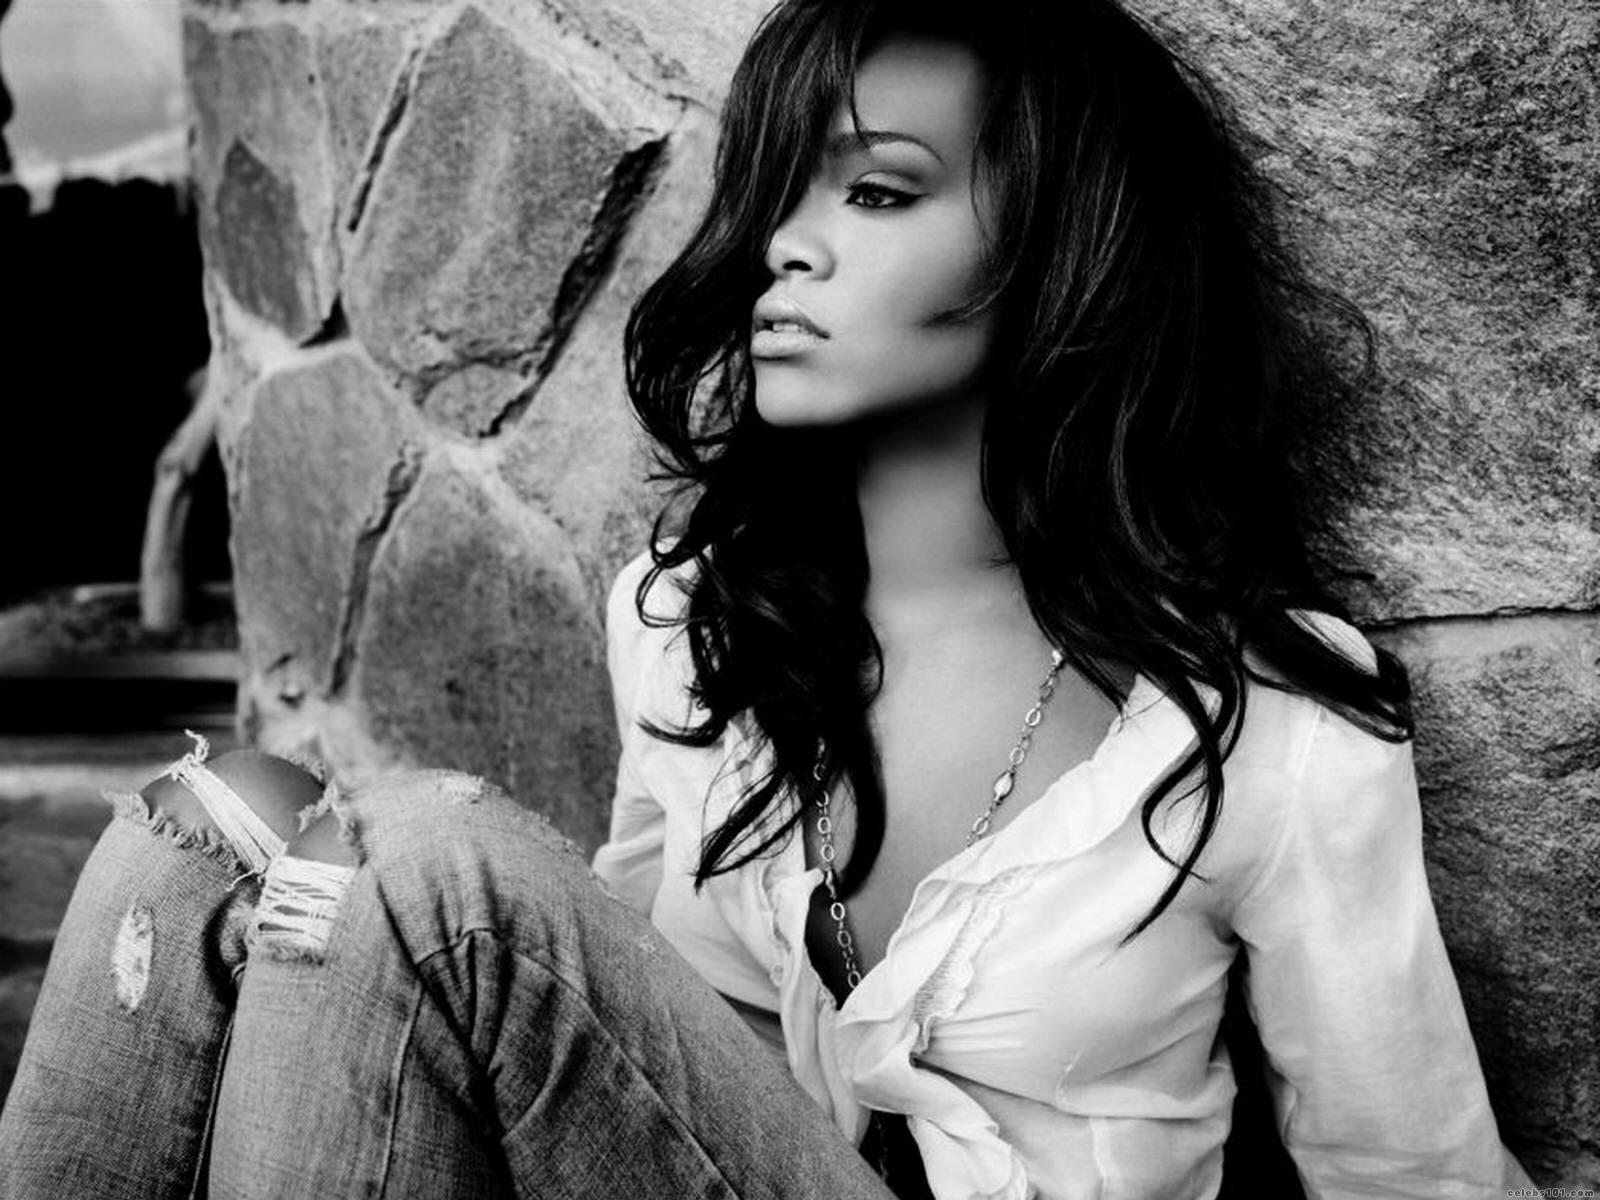 Rihanna black and white photoshoot full hd wallpaper download original voltagebd Gallery